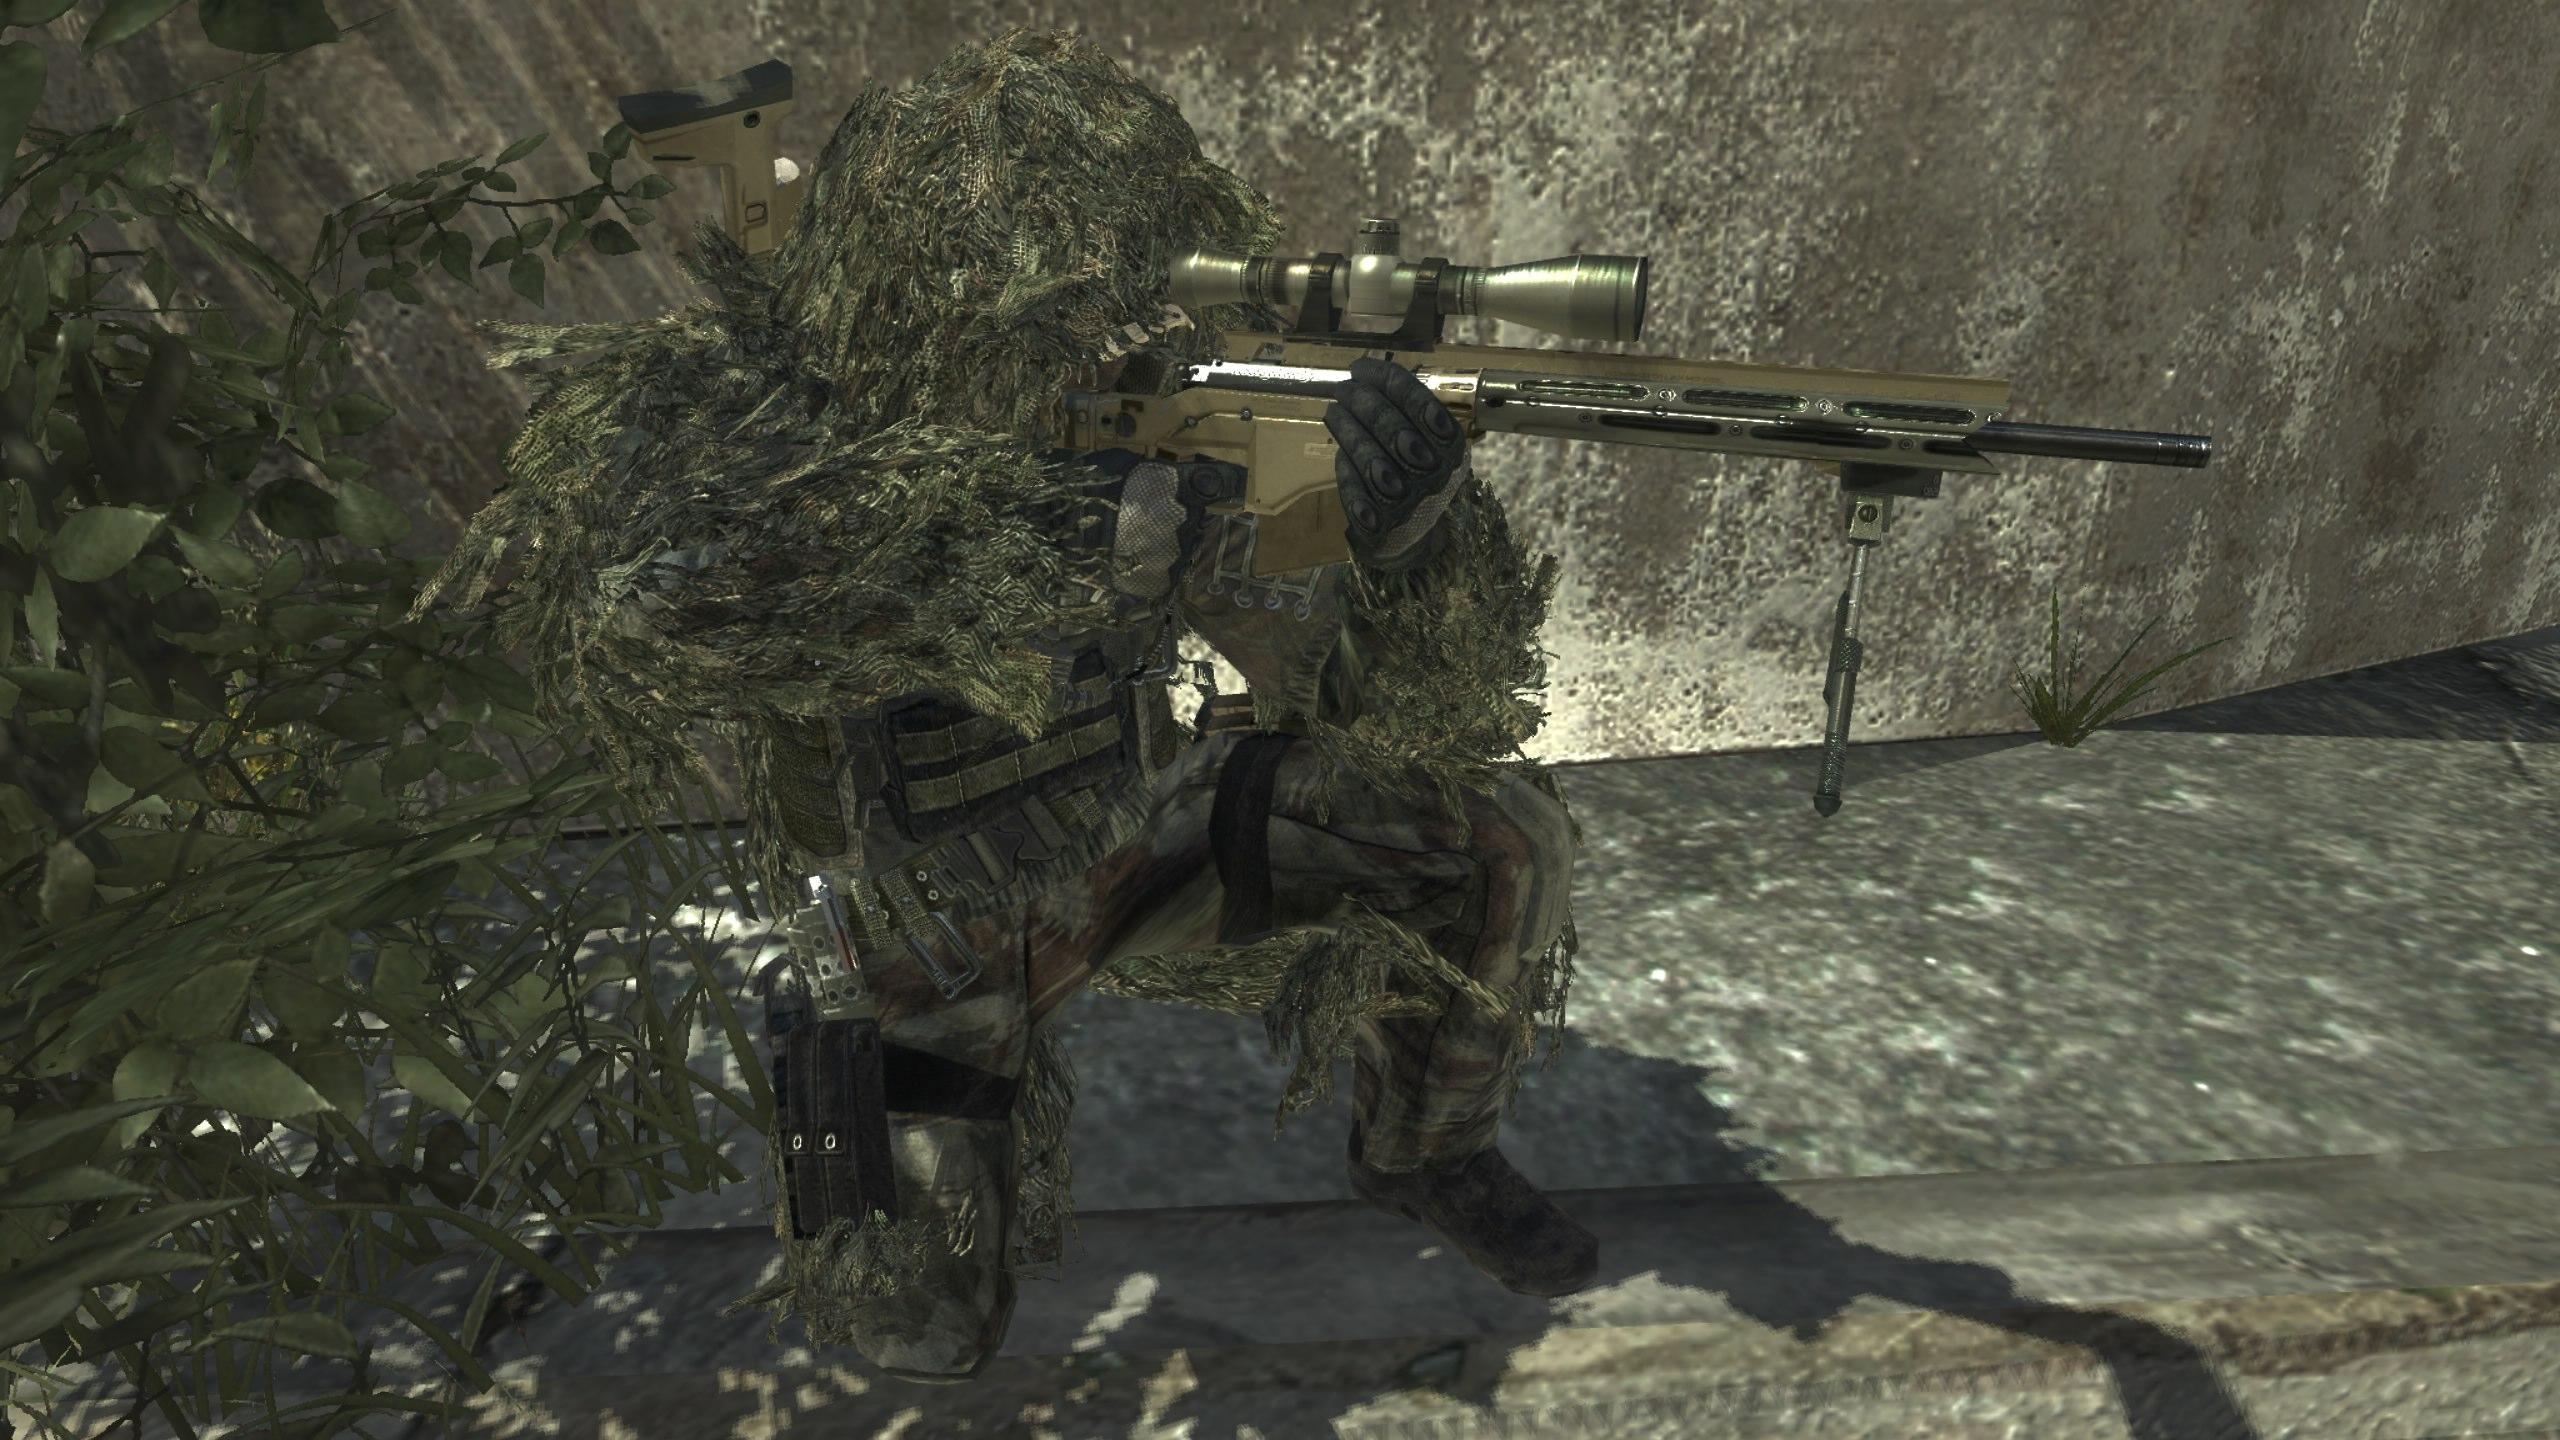 Call of Duty: Modern Warfare 3 | MW3 - Weapons List - Sniper Rifles